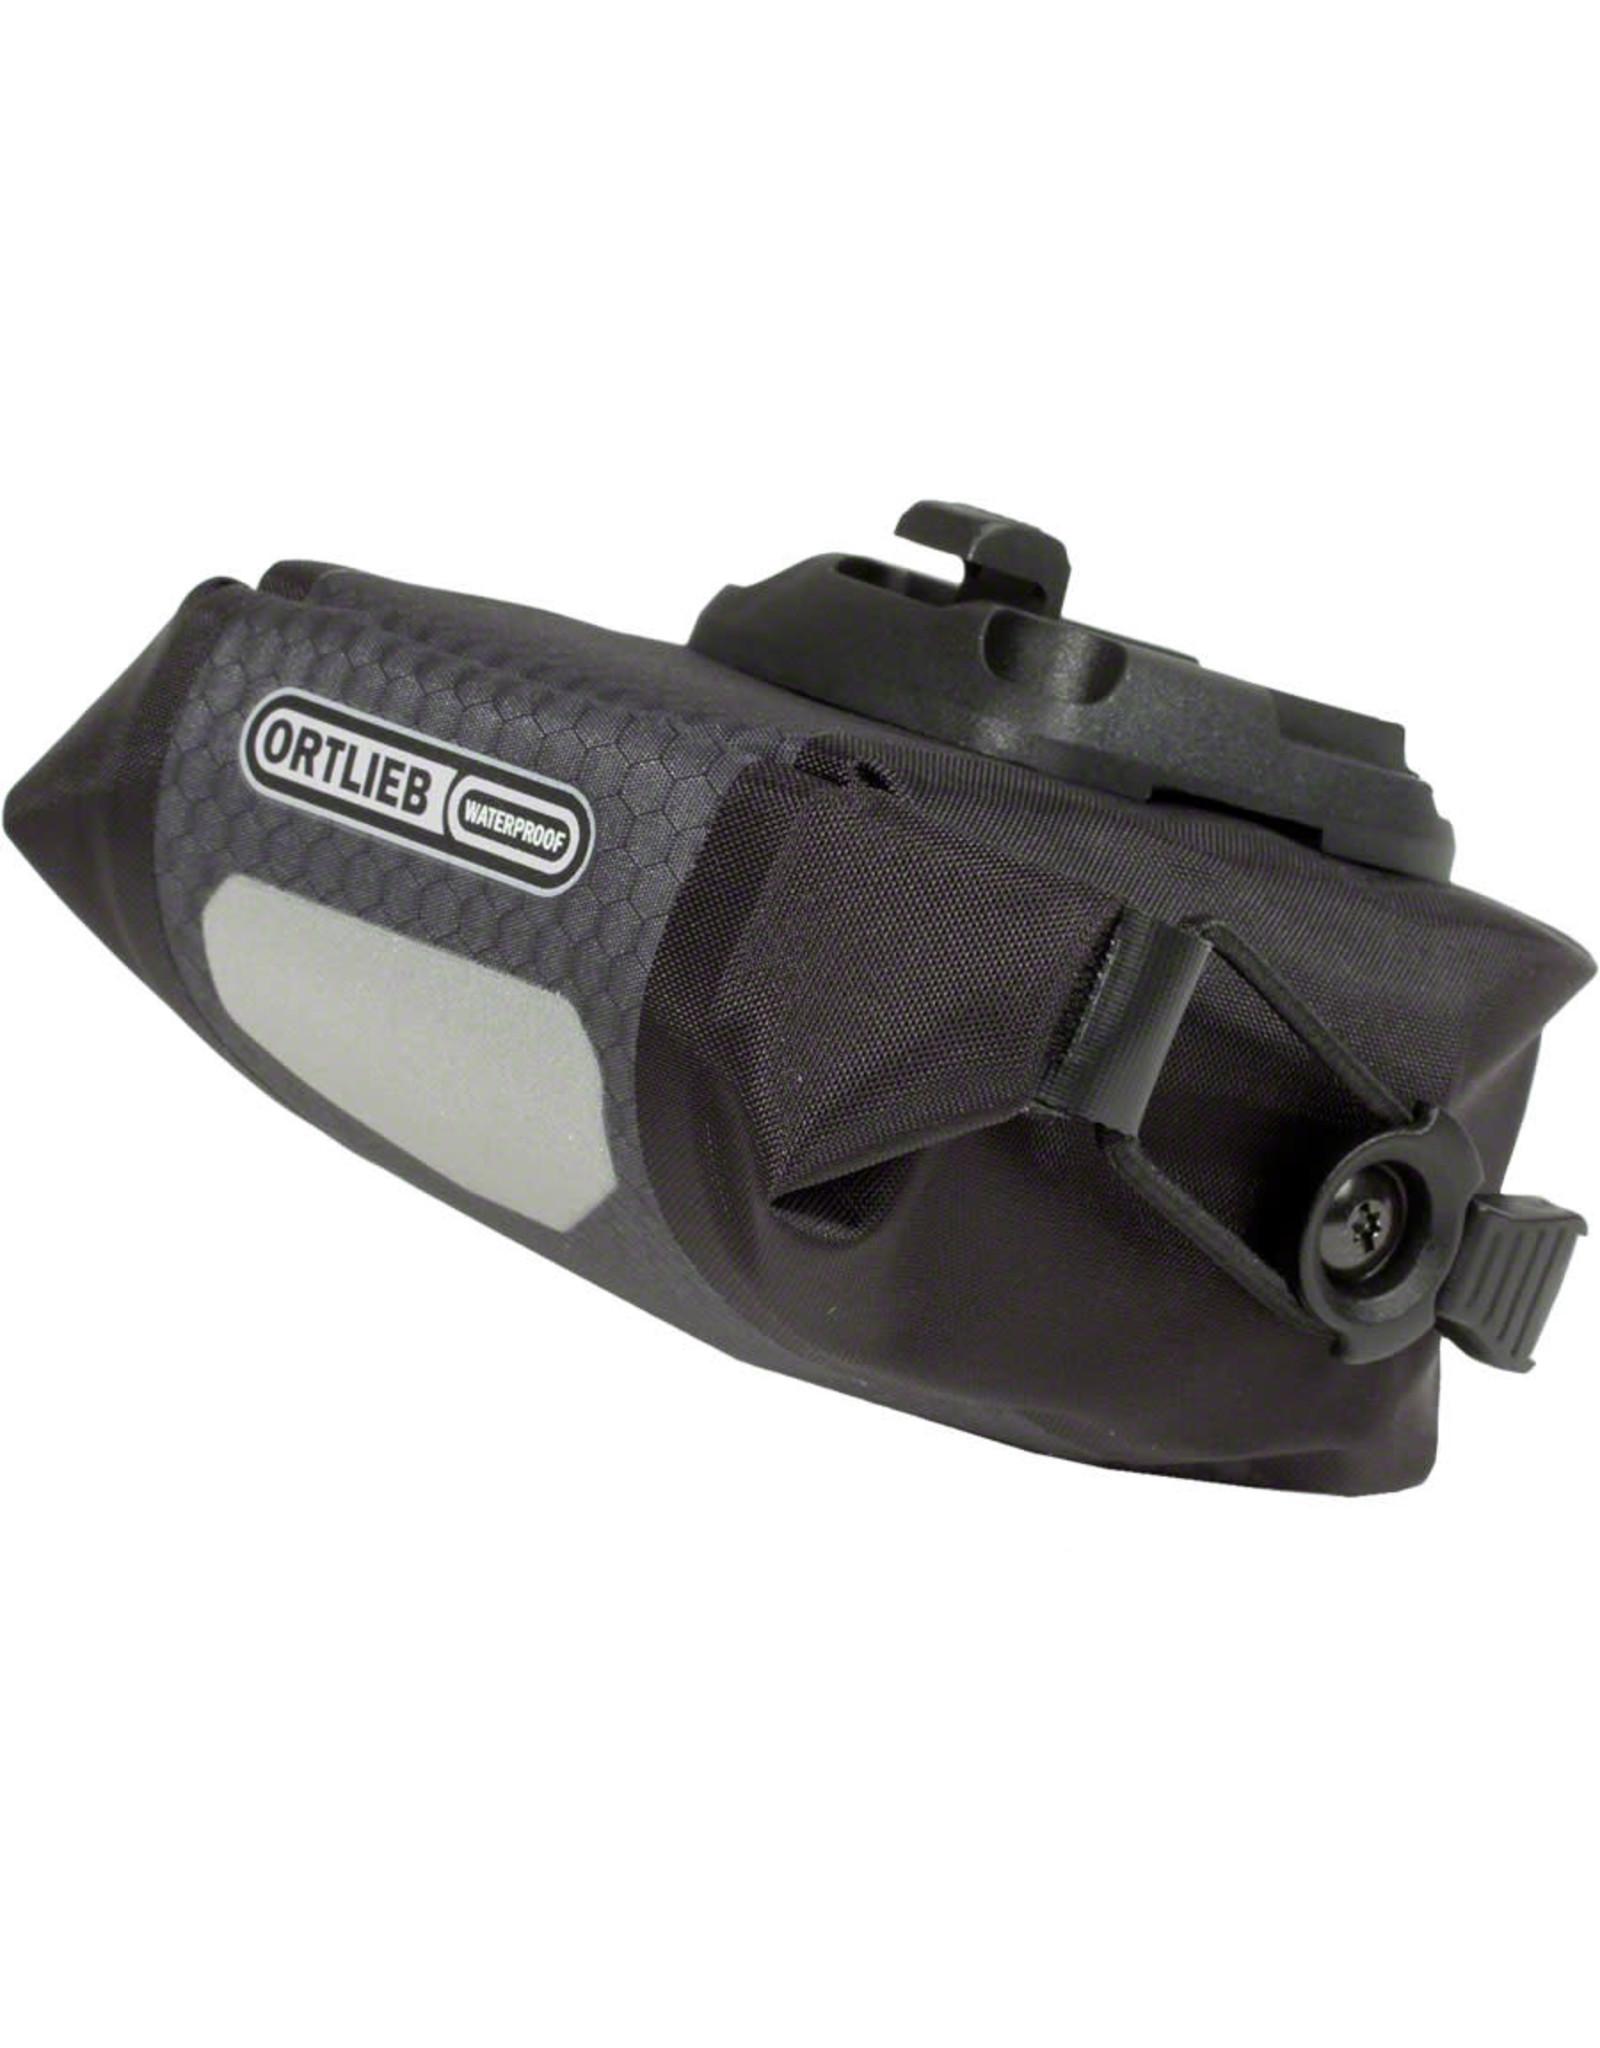 Ortlieb Ortlieb Micro Saddle Bag: Slate/Black